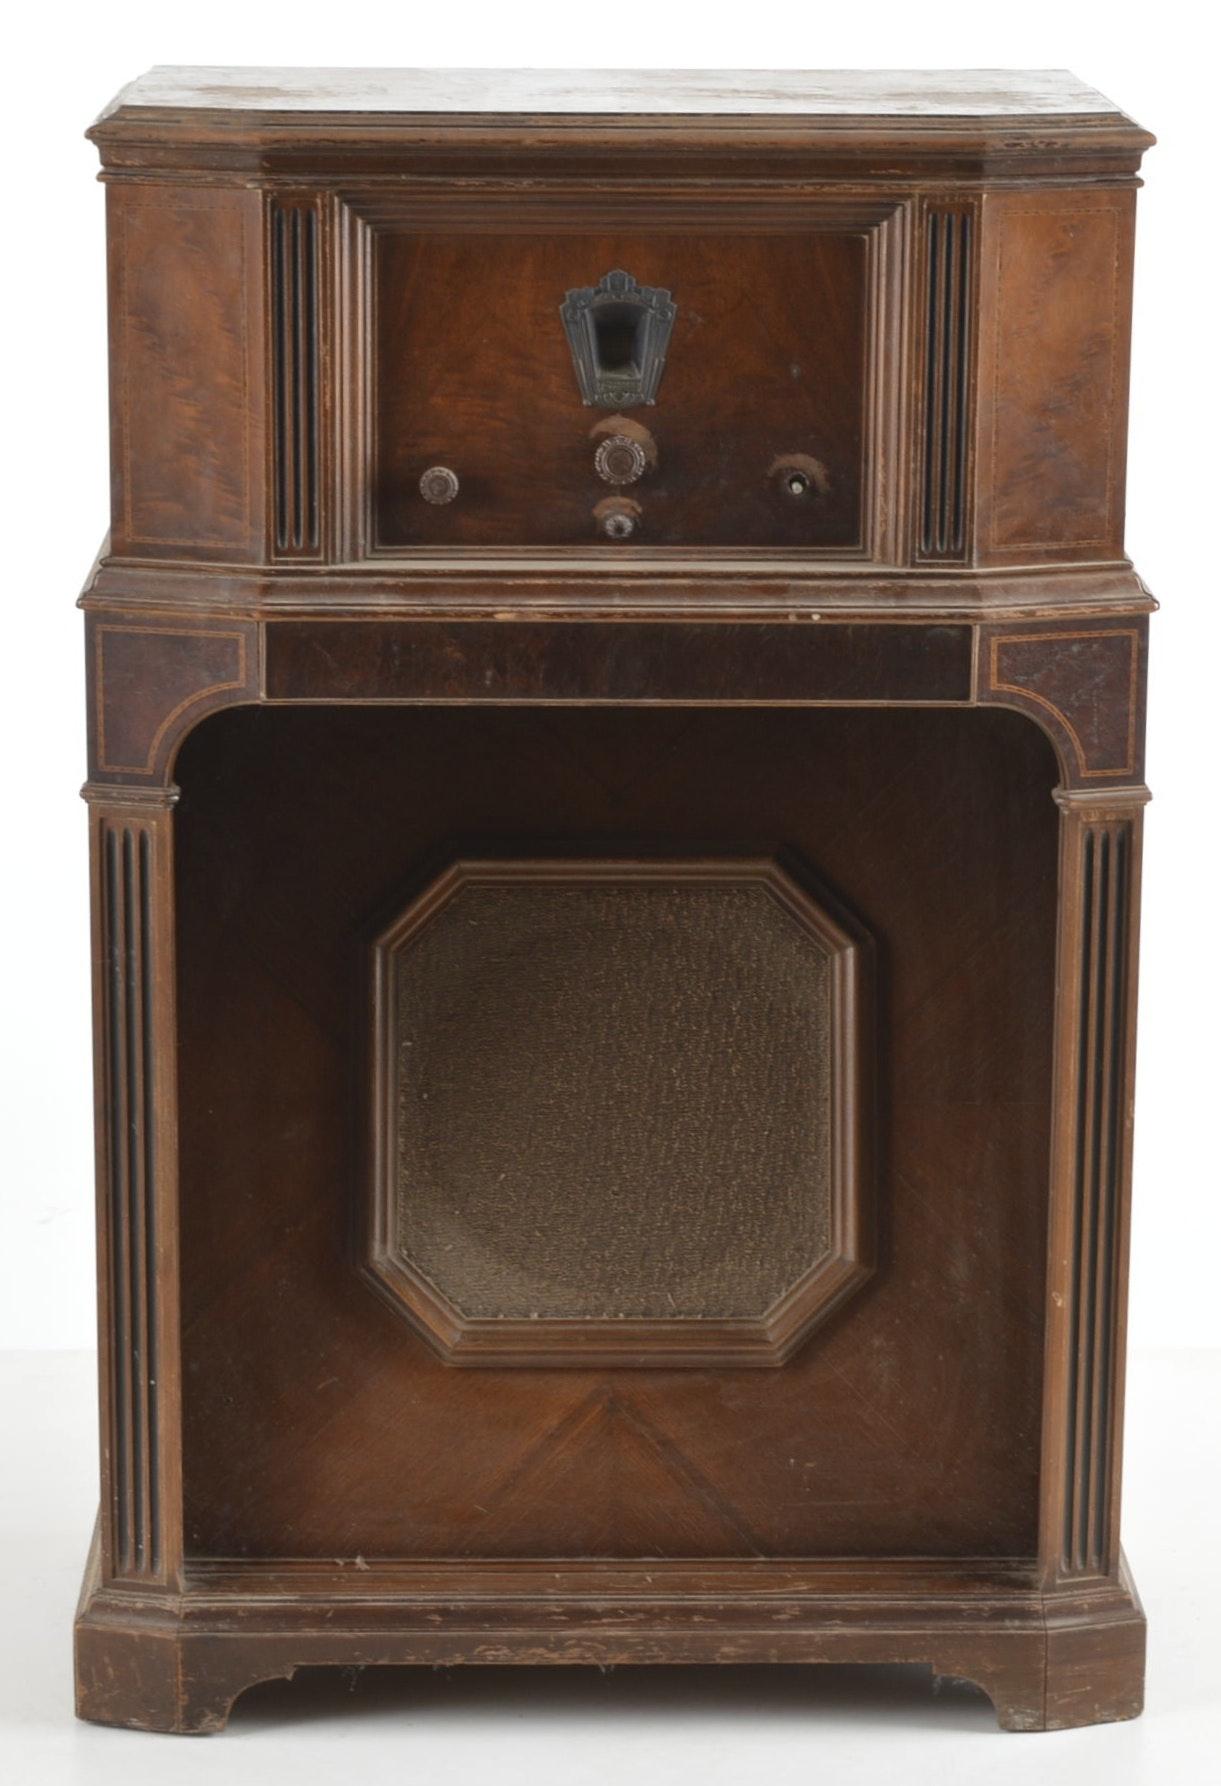 C 1935 Philco Super Heterodyne Eleven Radio Ebth